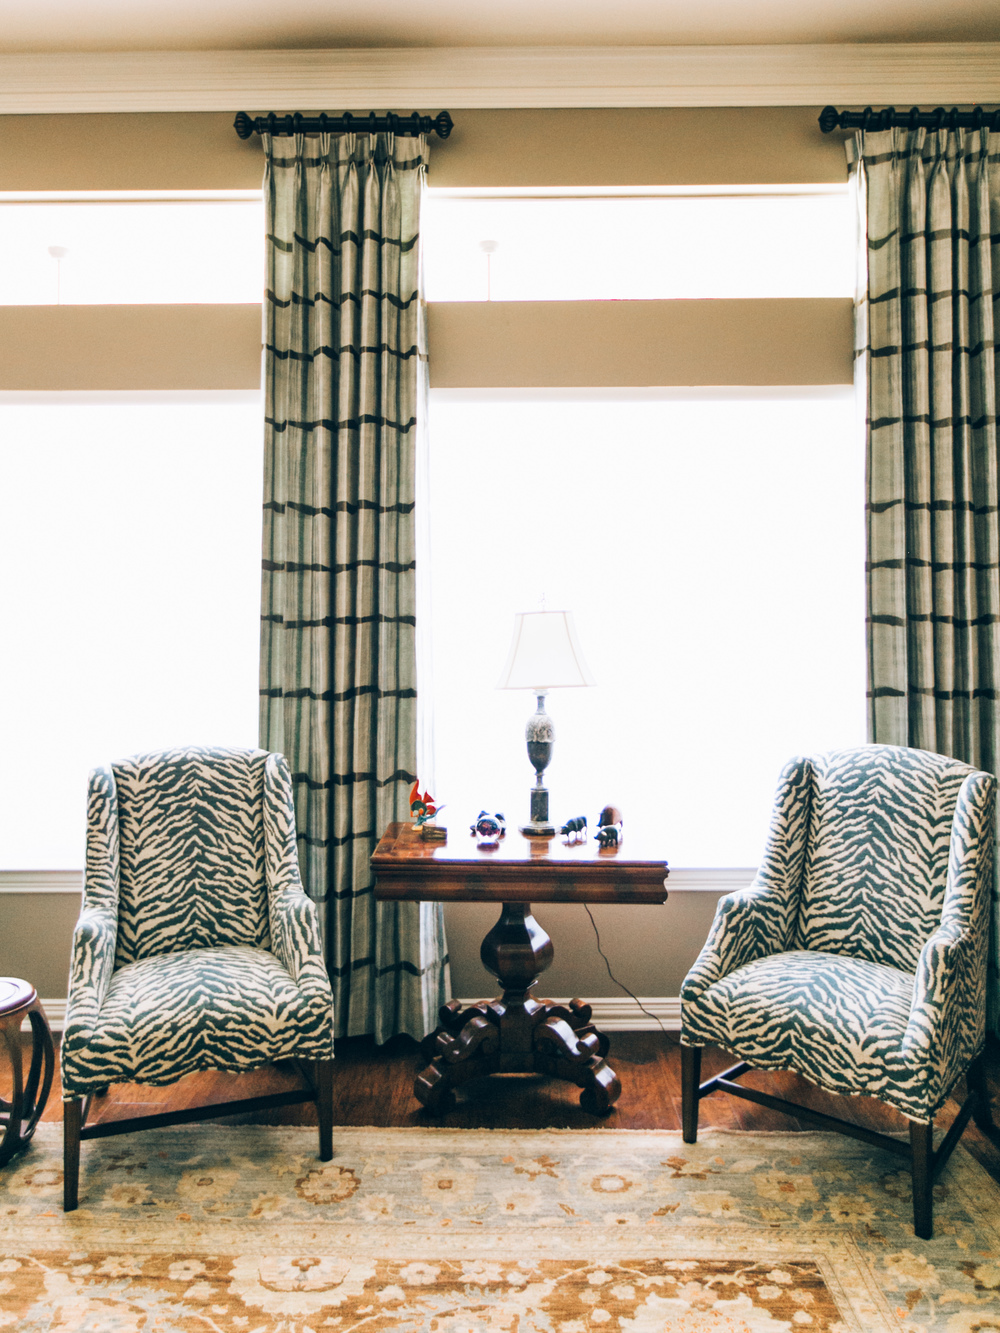 Interior-design-home-decorating-267.jpg